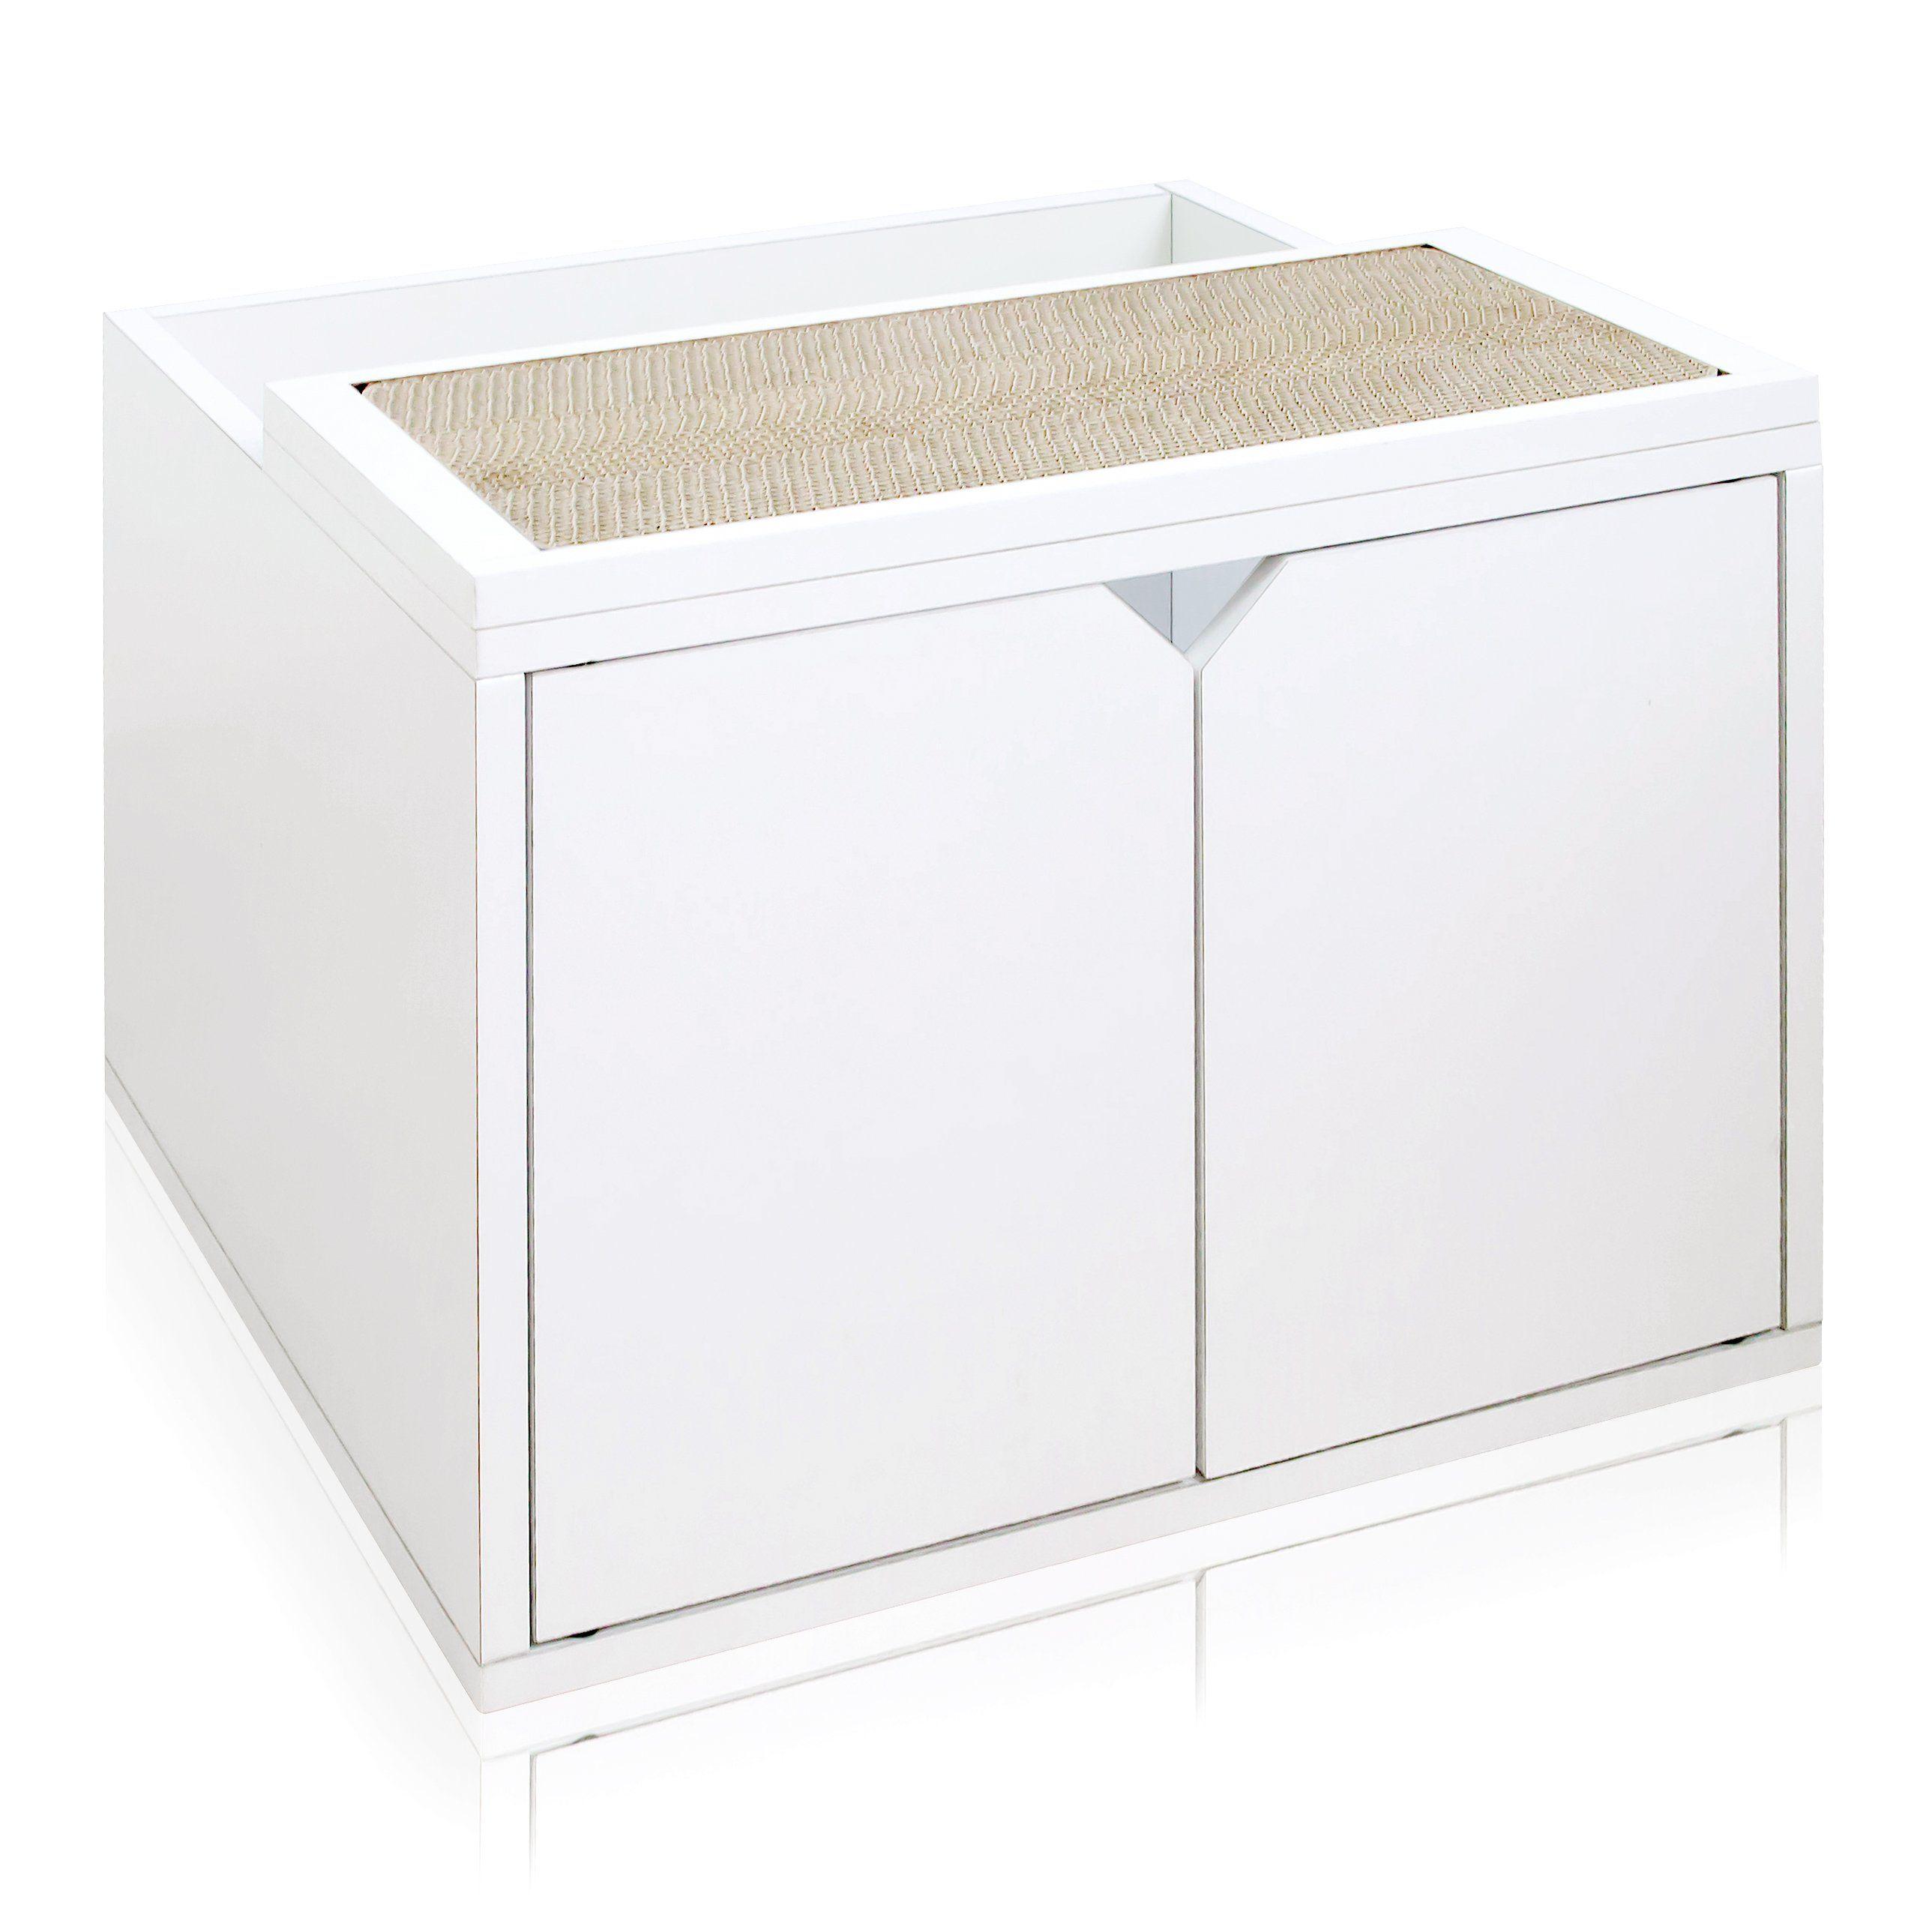 Cat Litter Enclosure, White Litter box enclosure, Cat